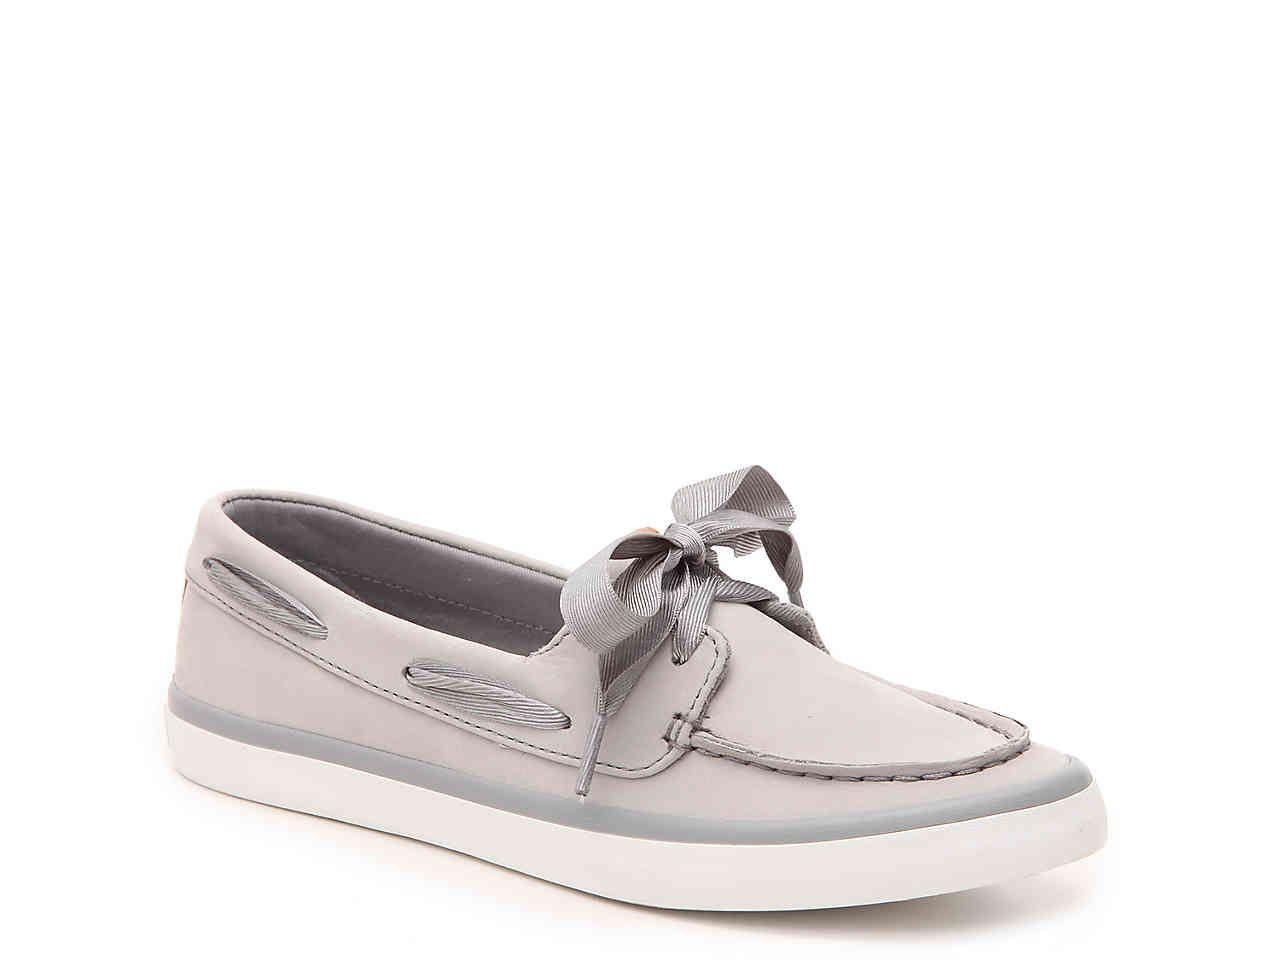 Sperry Top-Sider Sailor Boat Shoe